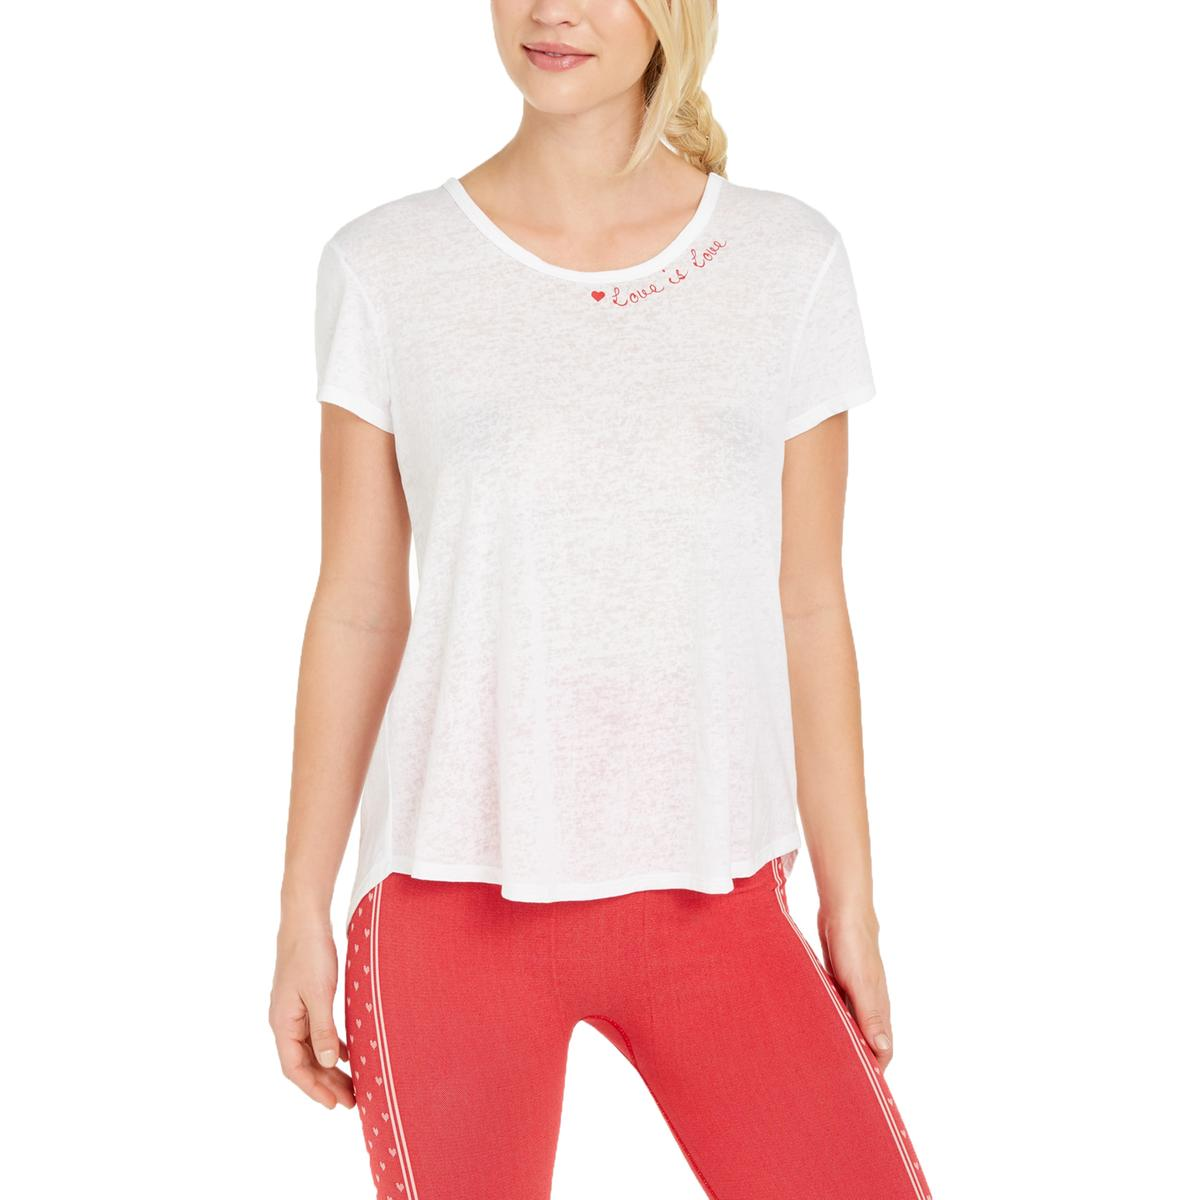 Ideology Womens Trust The Universe  Graphic Yoga Tee T-Shirt BHFO 7307